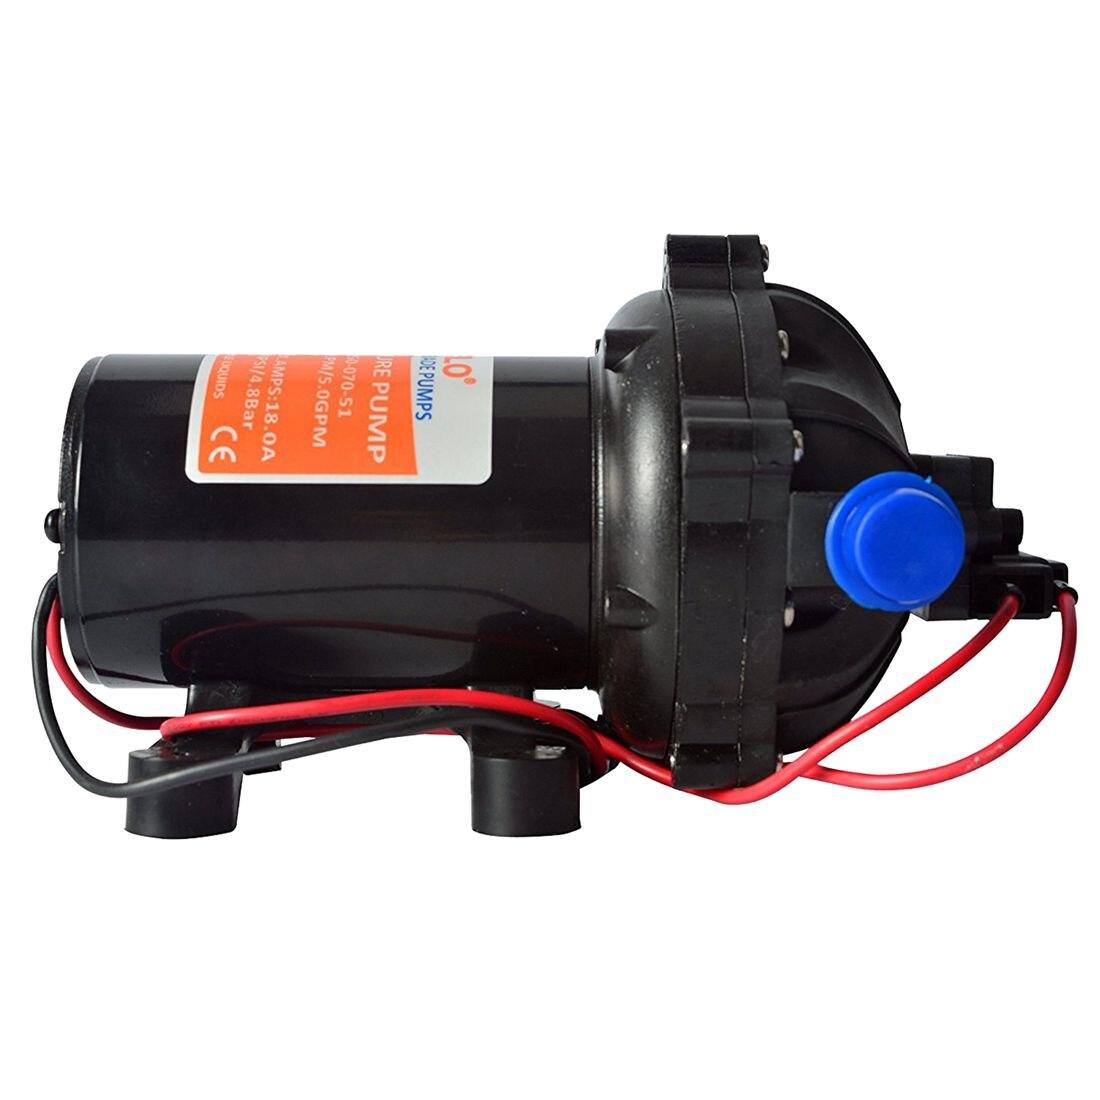 SEAFLO 12v Water Pressure Diaphragm Pump 18.9 L/min 5.0 Gpm 60 Psi - Caravan/RV/boat/marine water pump seaflo 35psi 12 5 lpm electric self priming diaphragm pump 12v water pumps caravan